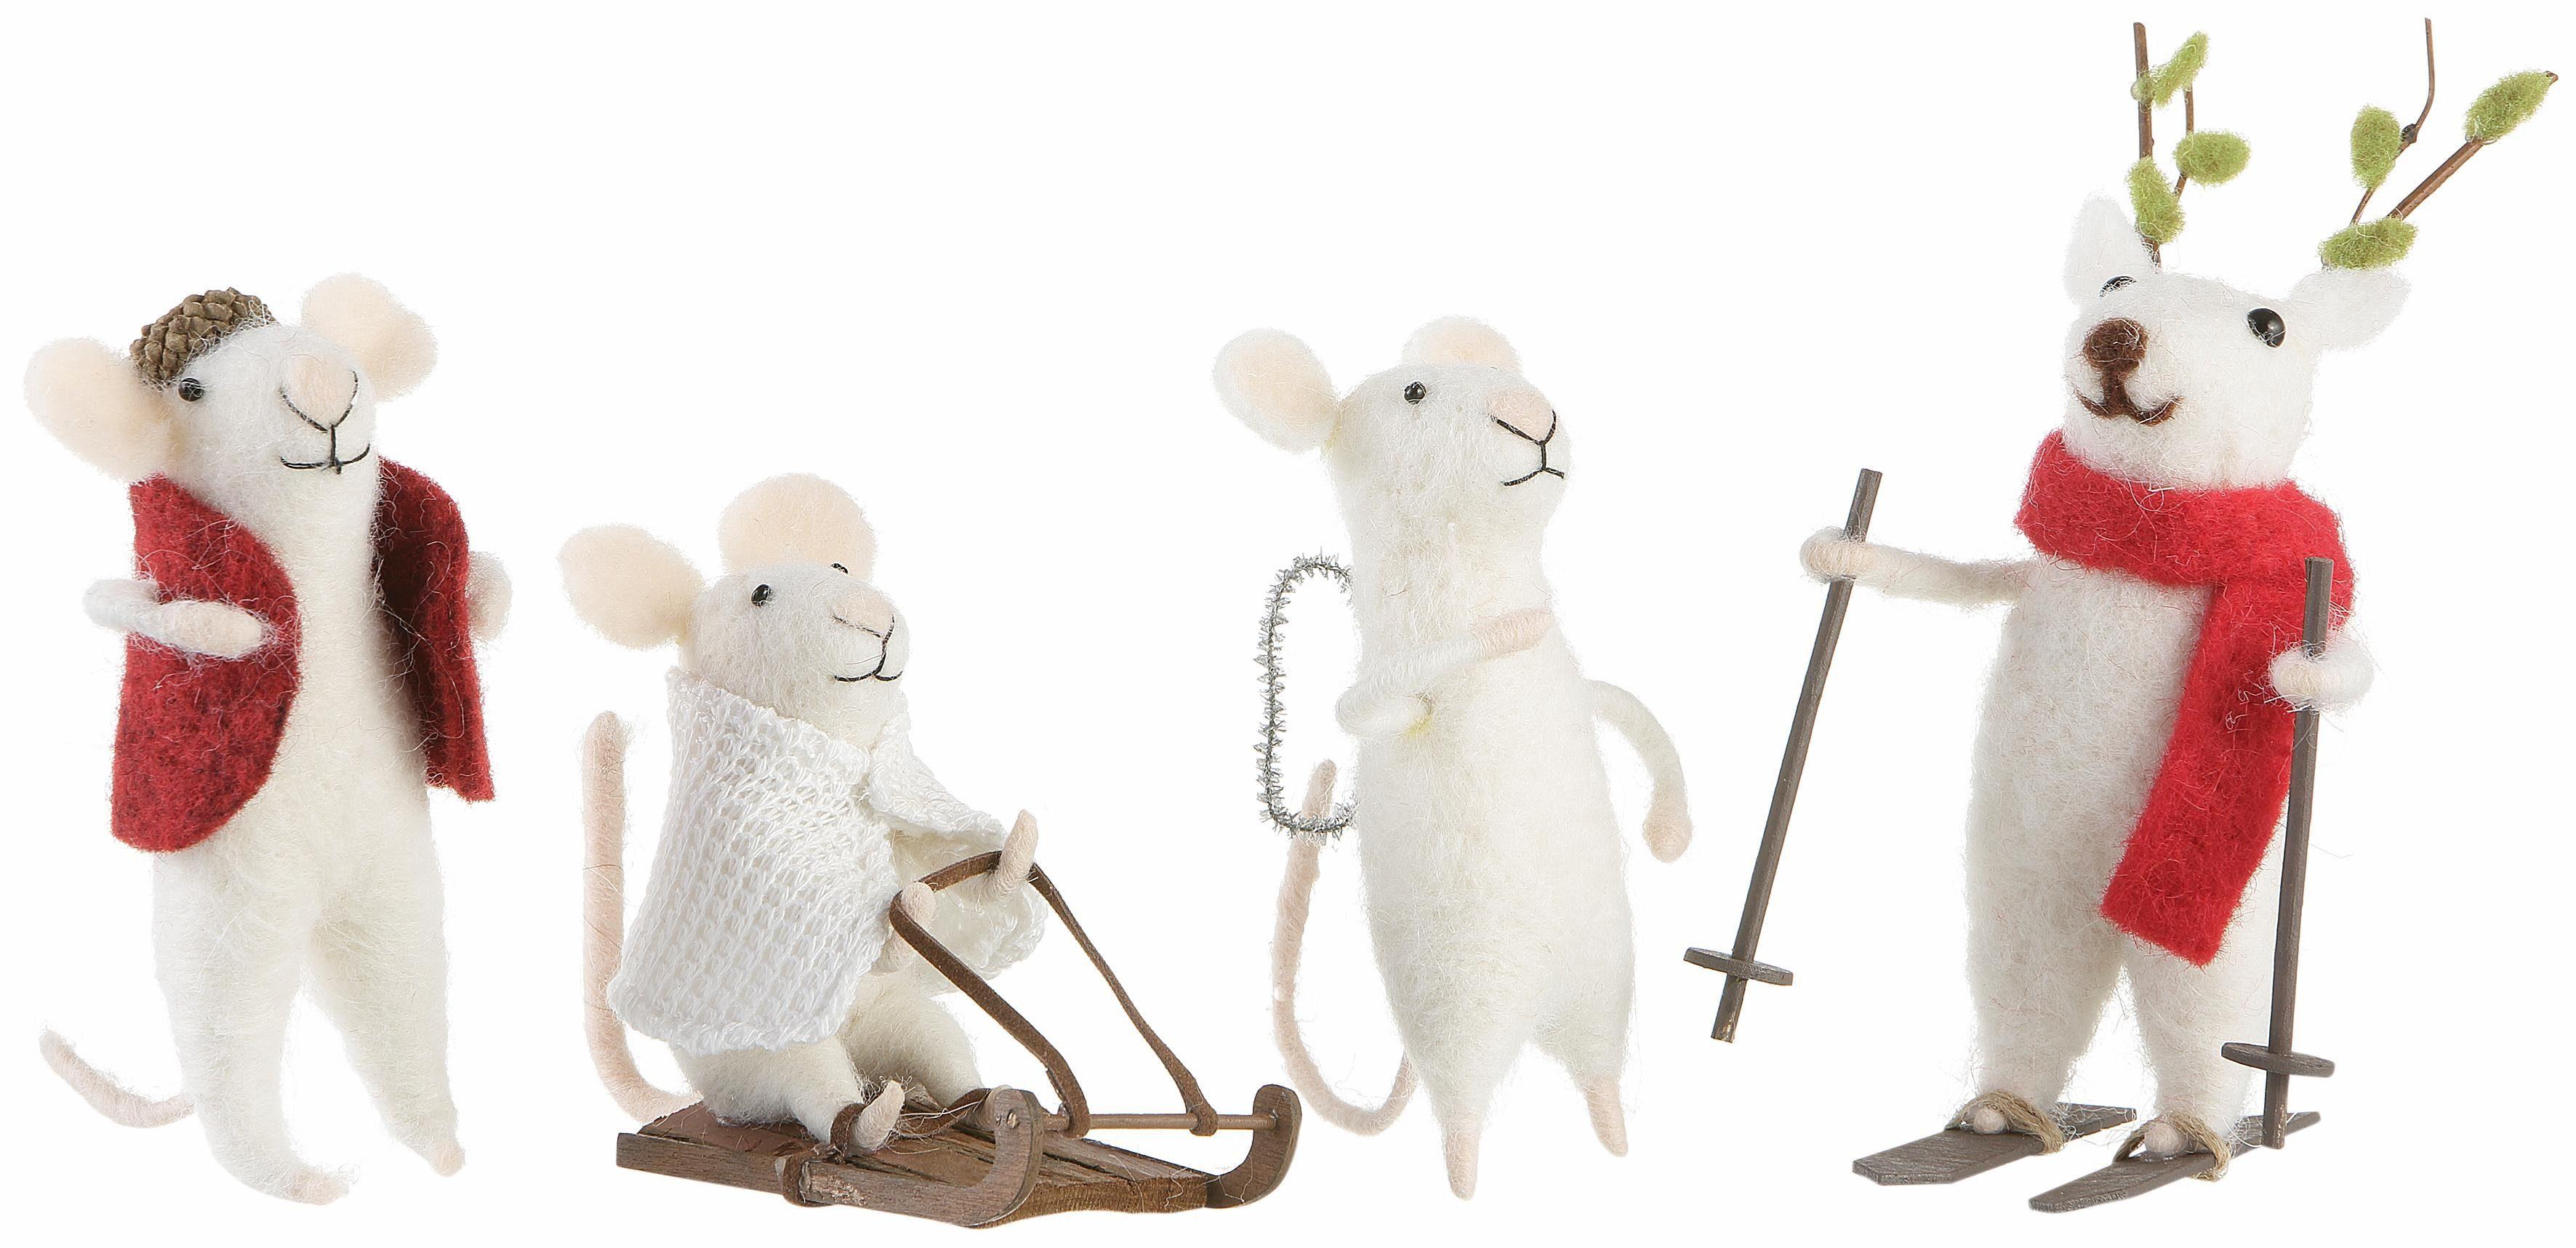 INGE-GLAS® Deko-Mäuse aus Filzwolle, 4er Set